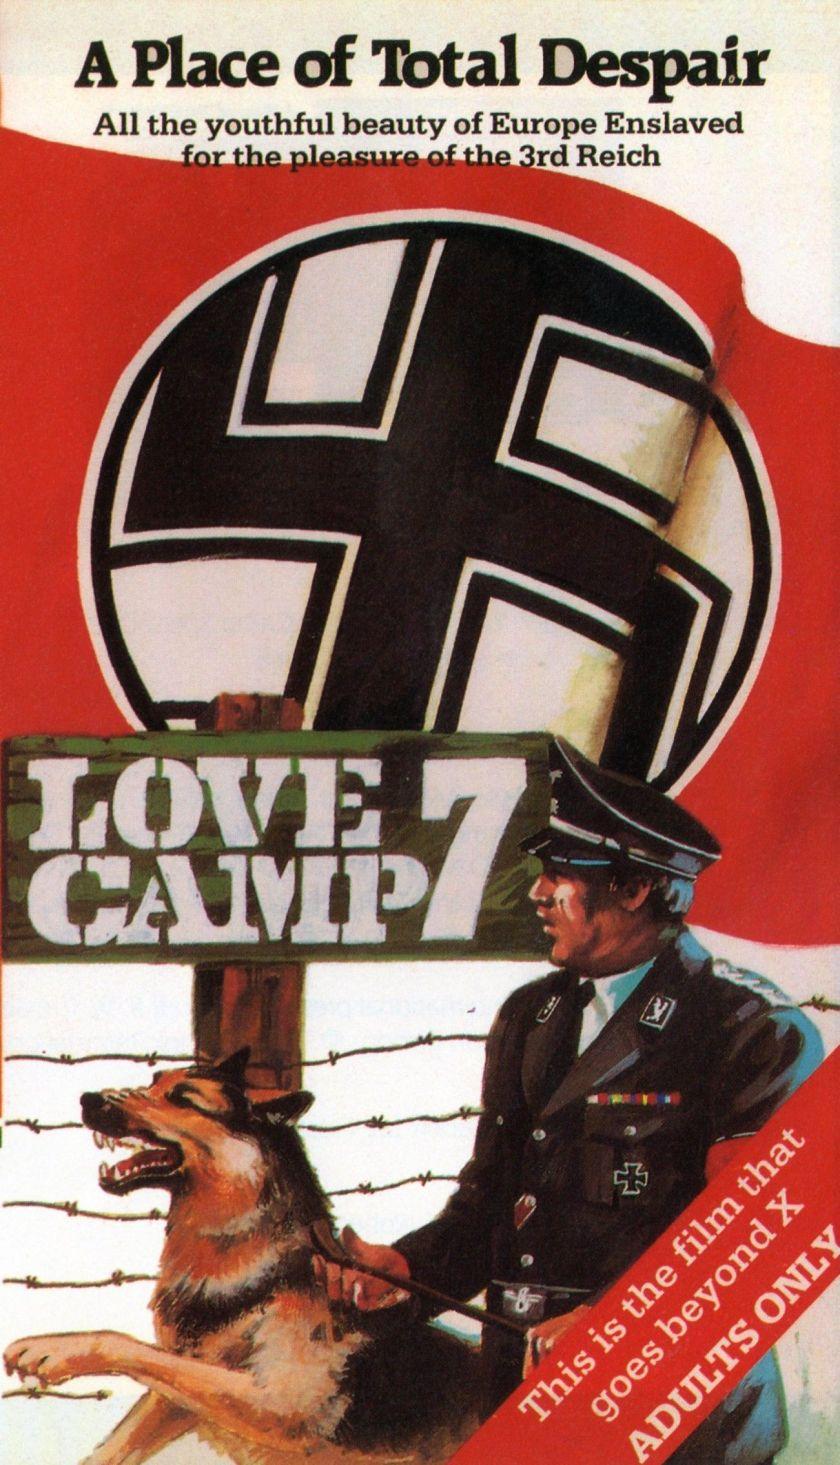 love-camp-7-vhs